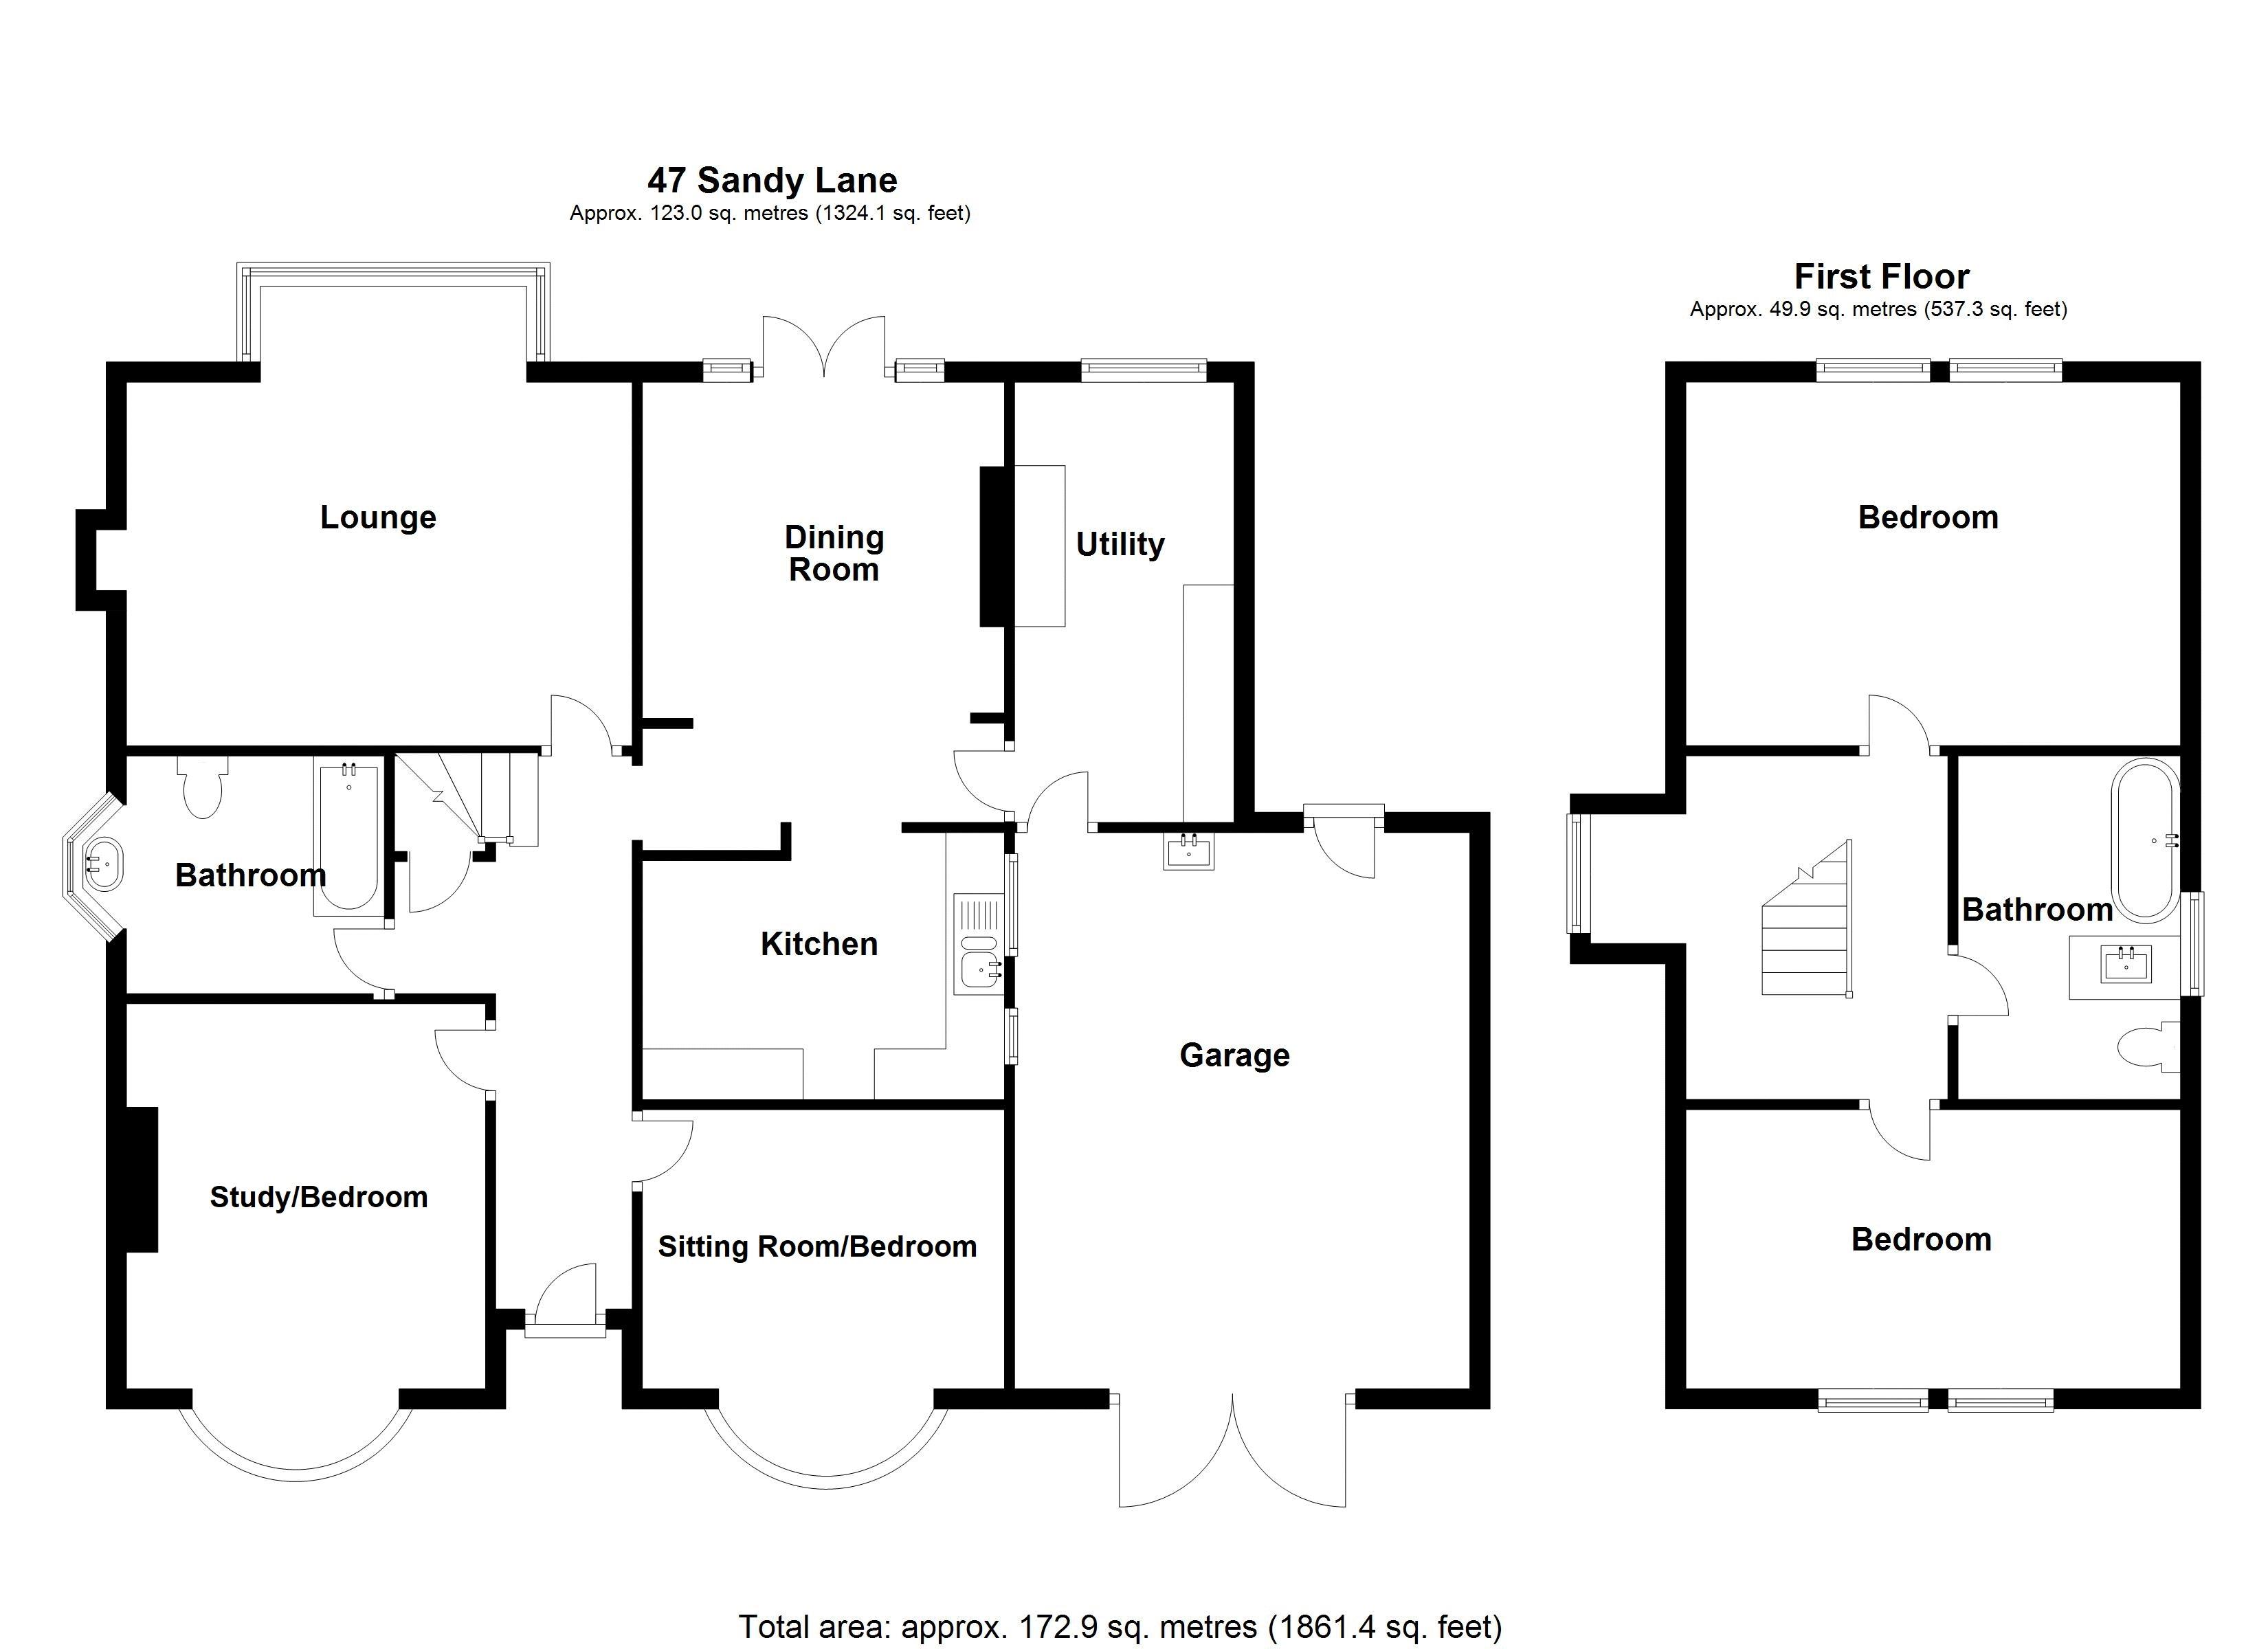 Floor Plan - Main House